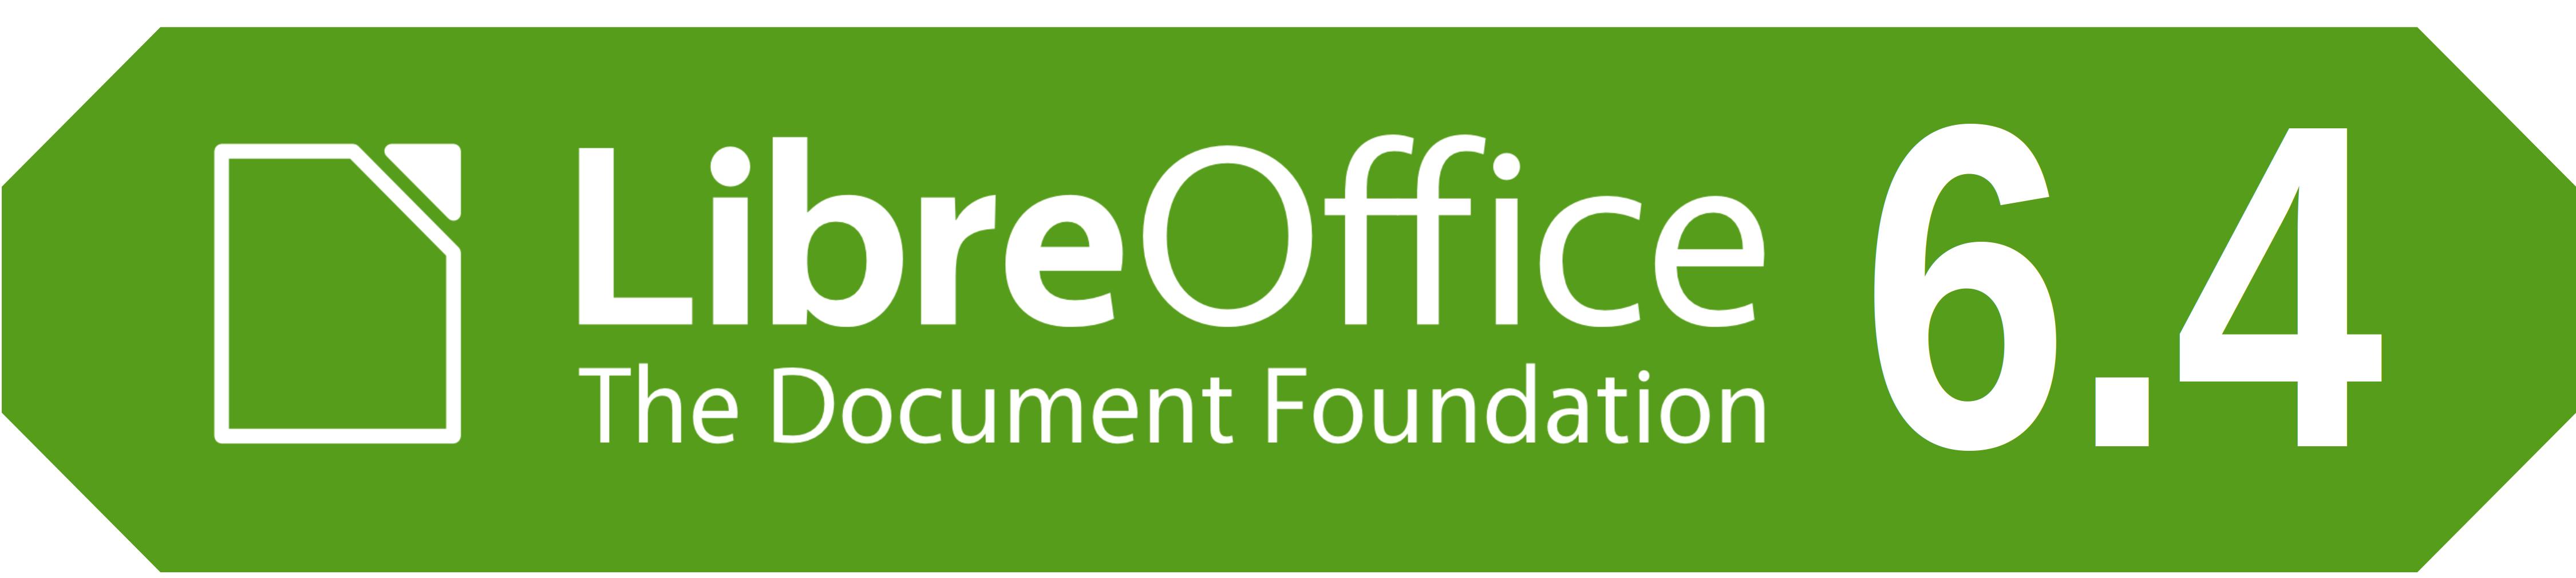 LibreOffice 6.4 logó